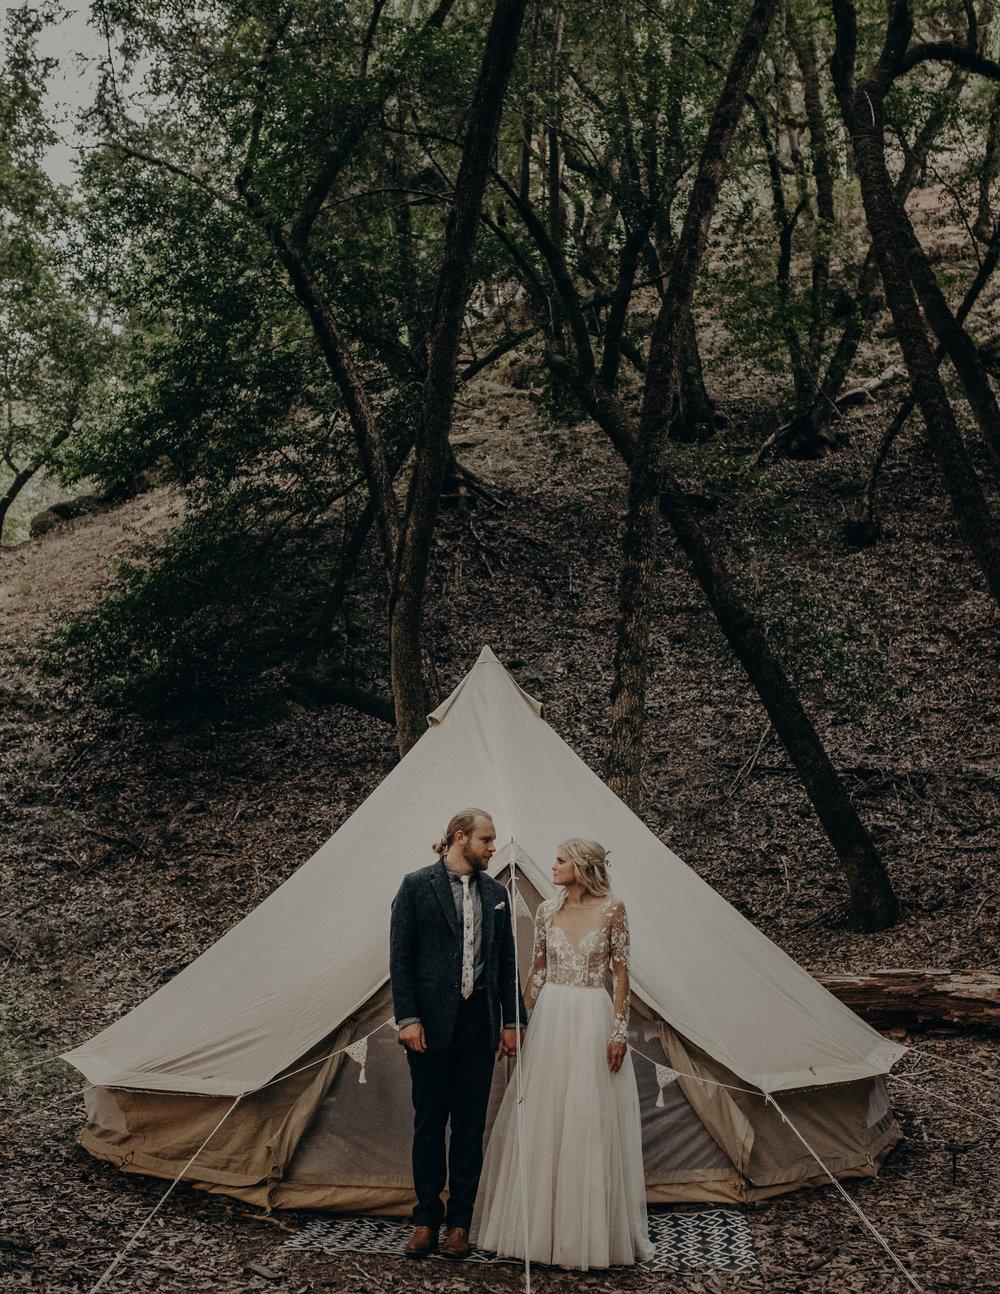 IsaiahAndTaylor.com - California Destination Elopement, Lake Leonard Reserve Wedding, Ukiah-131.jpg